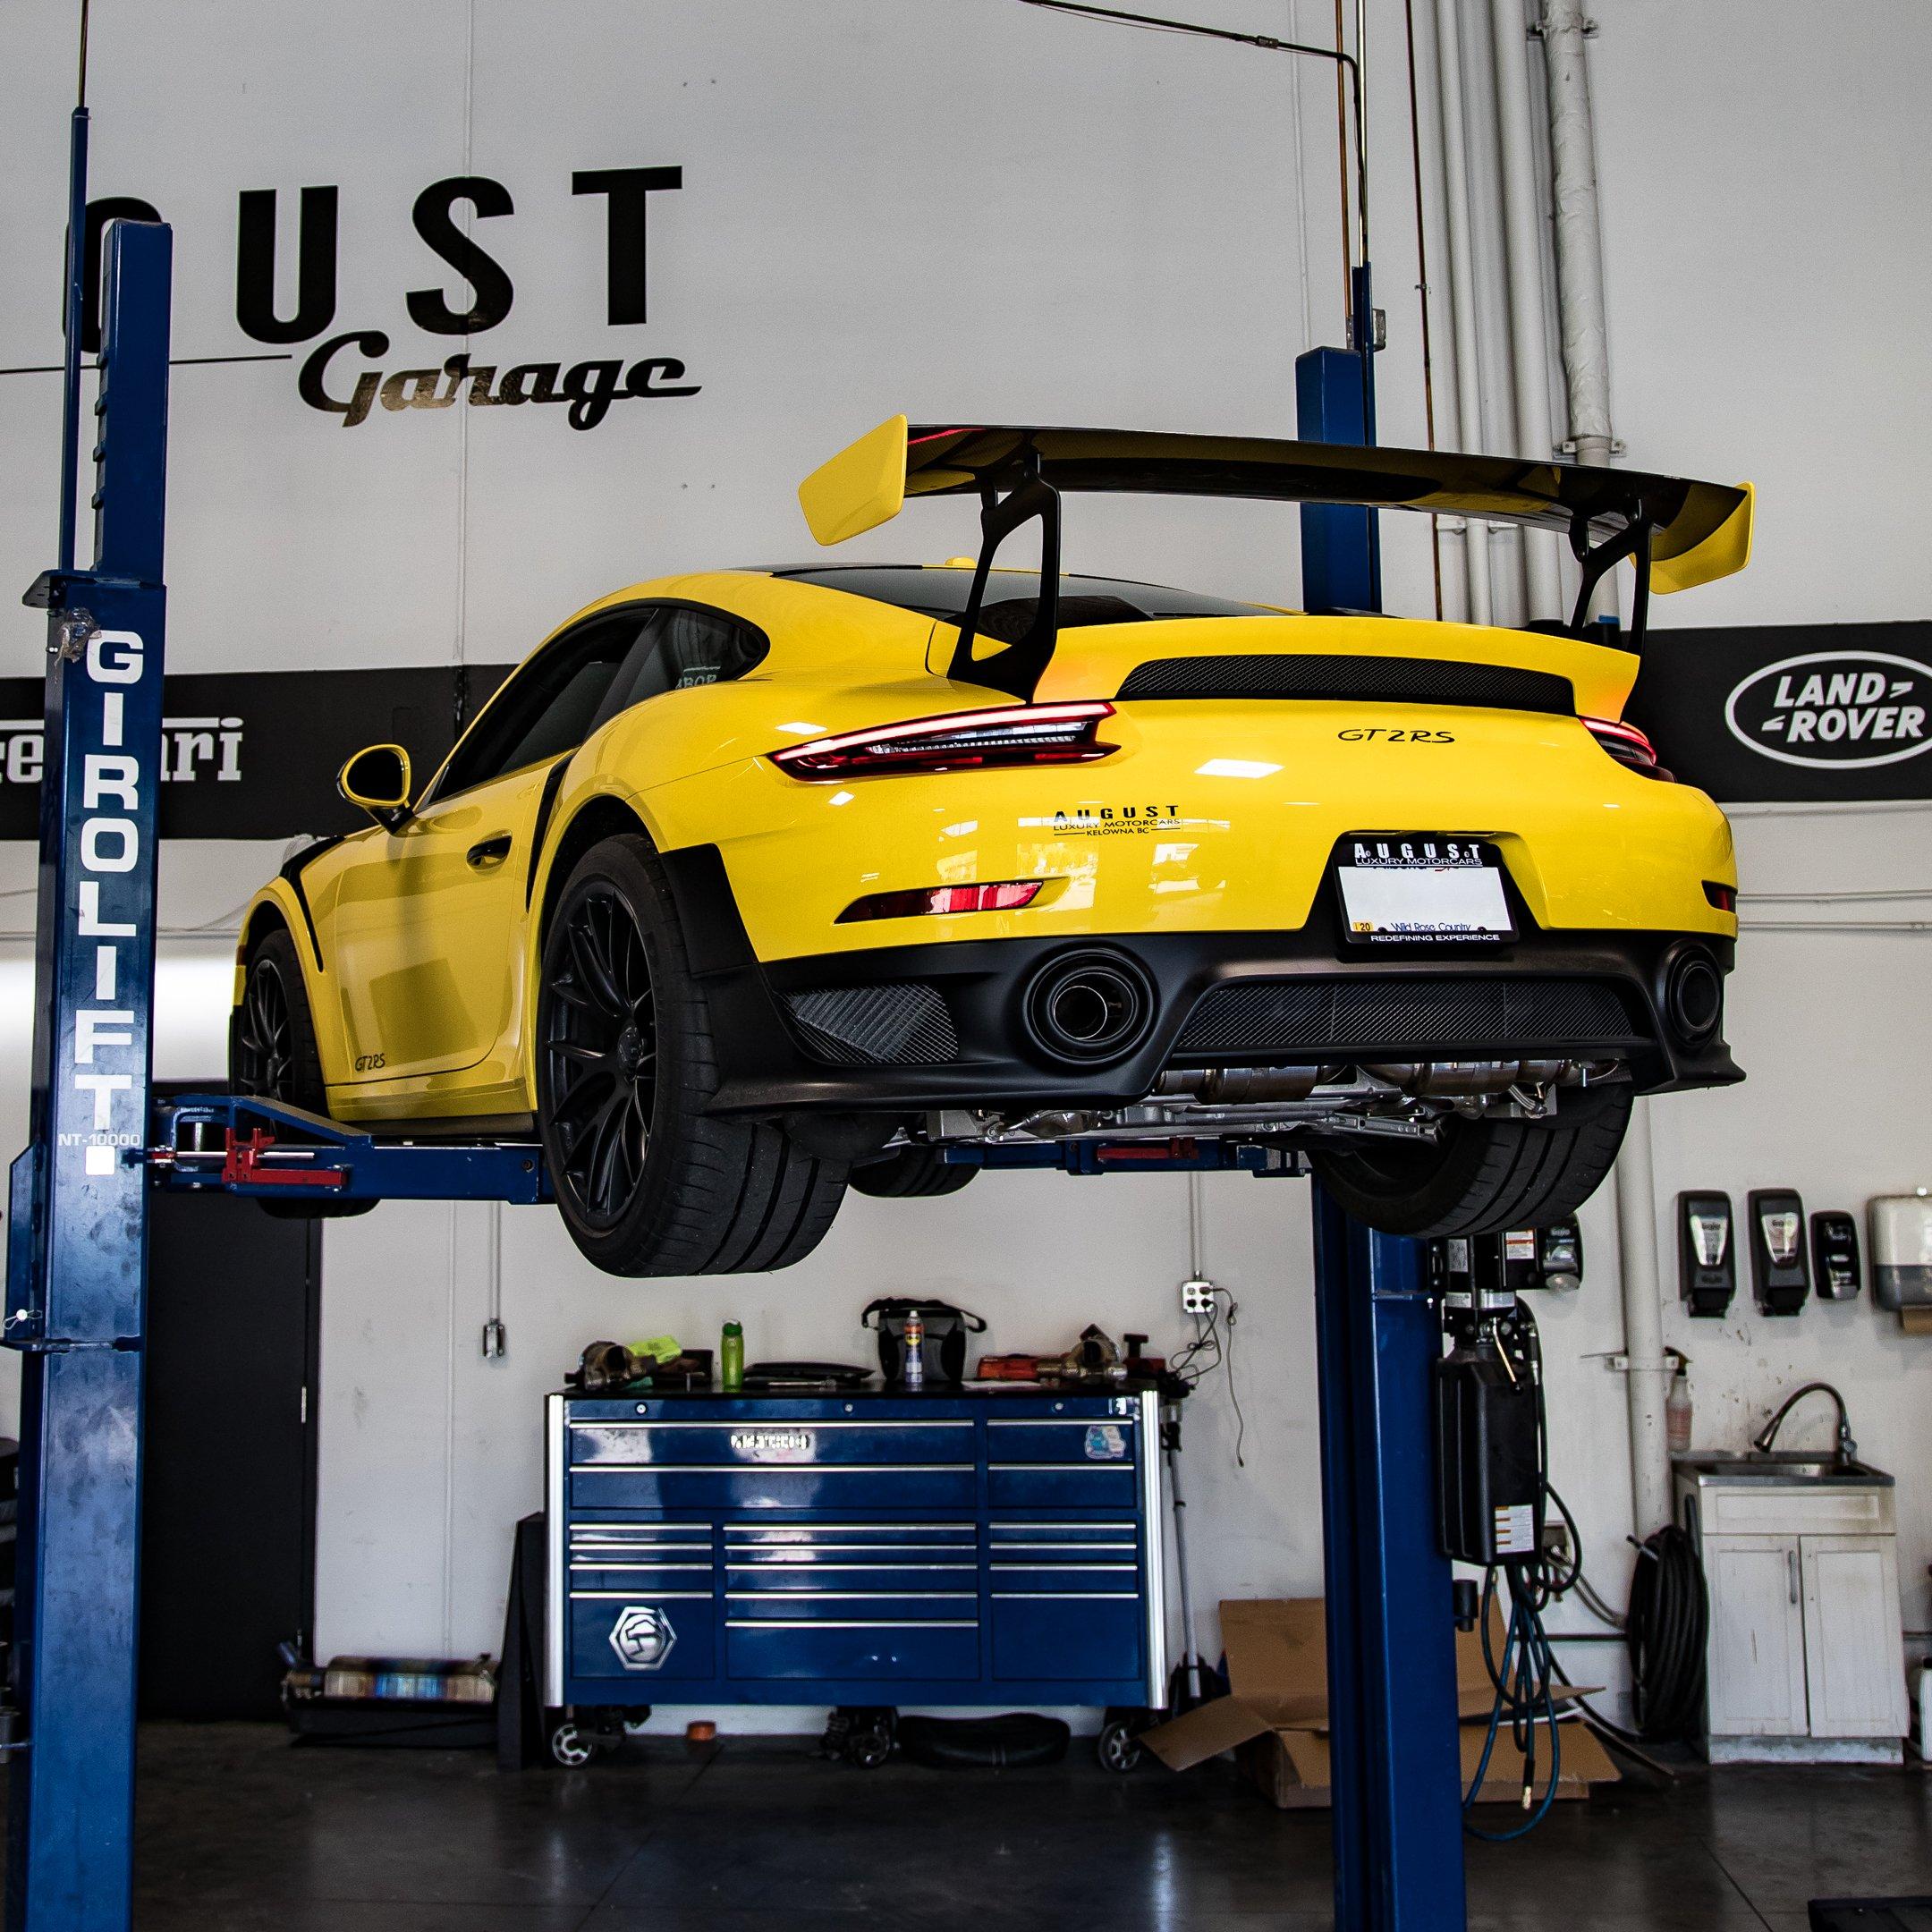 Fi Exhaust Install - Frequency Intelligent Exhaust - Porsche 911 GT2 RS at August Garage